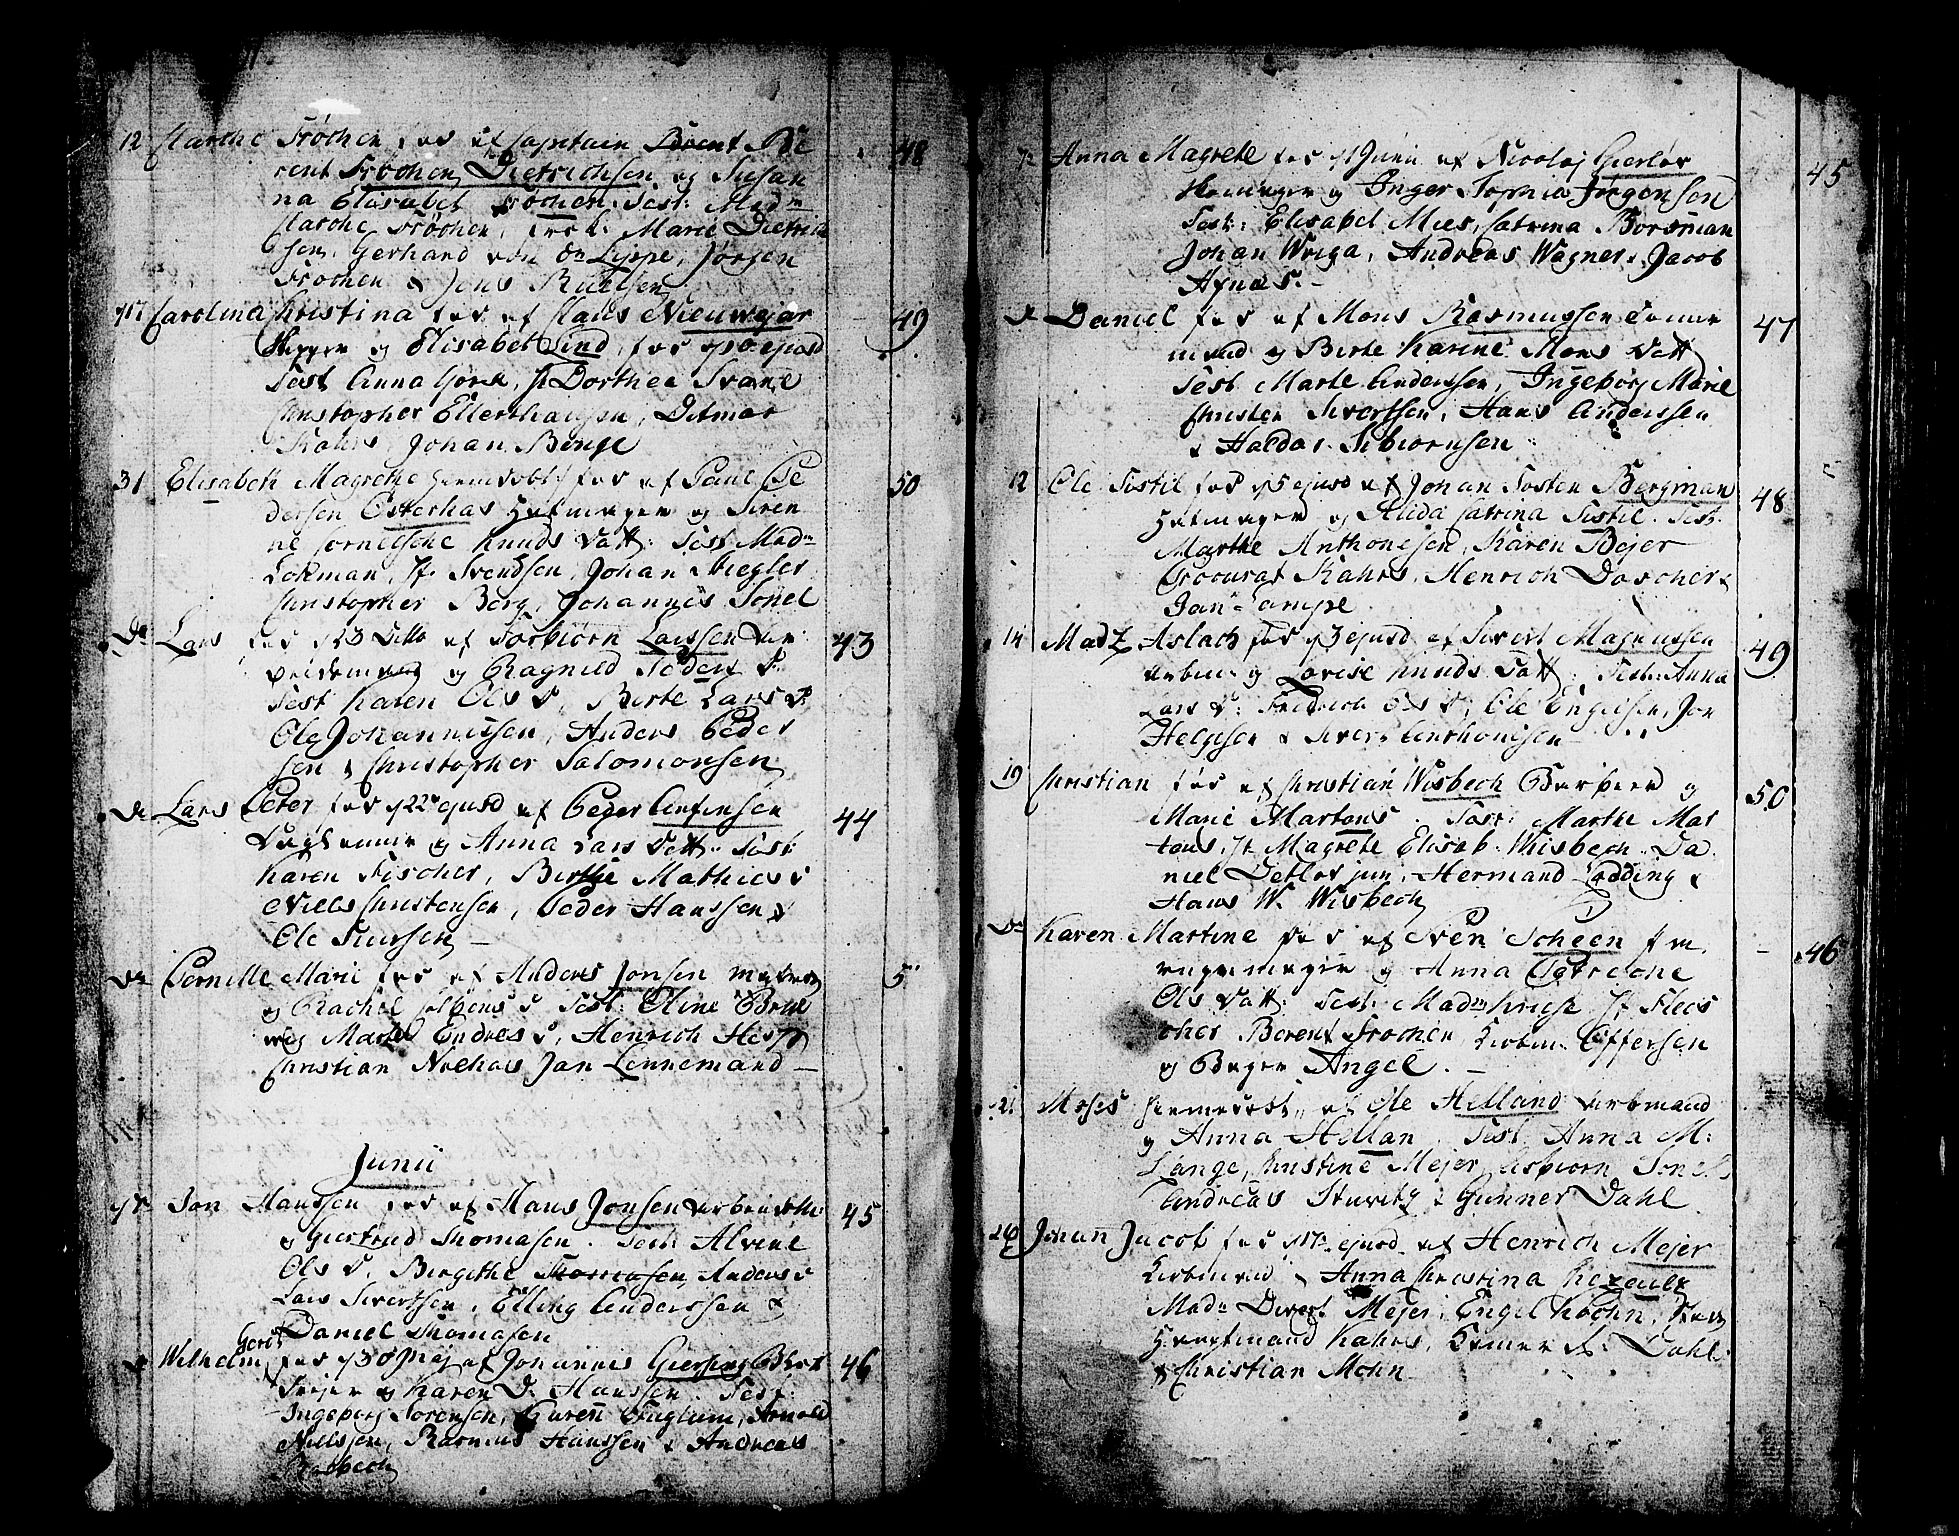 SAB, Domkirken sokneprestembete, H/Haa/L0004: Ministerialbok nr. A 4, 1763-1820, s. 254-255